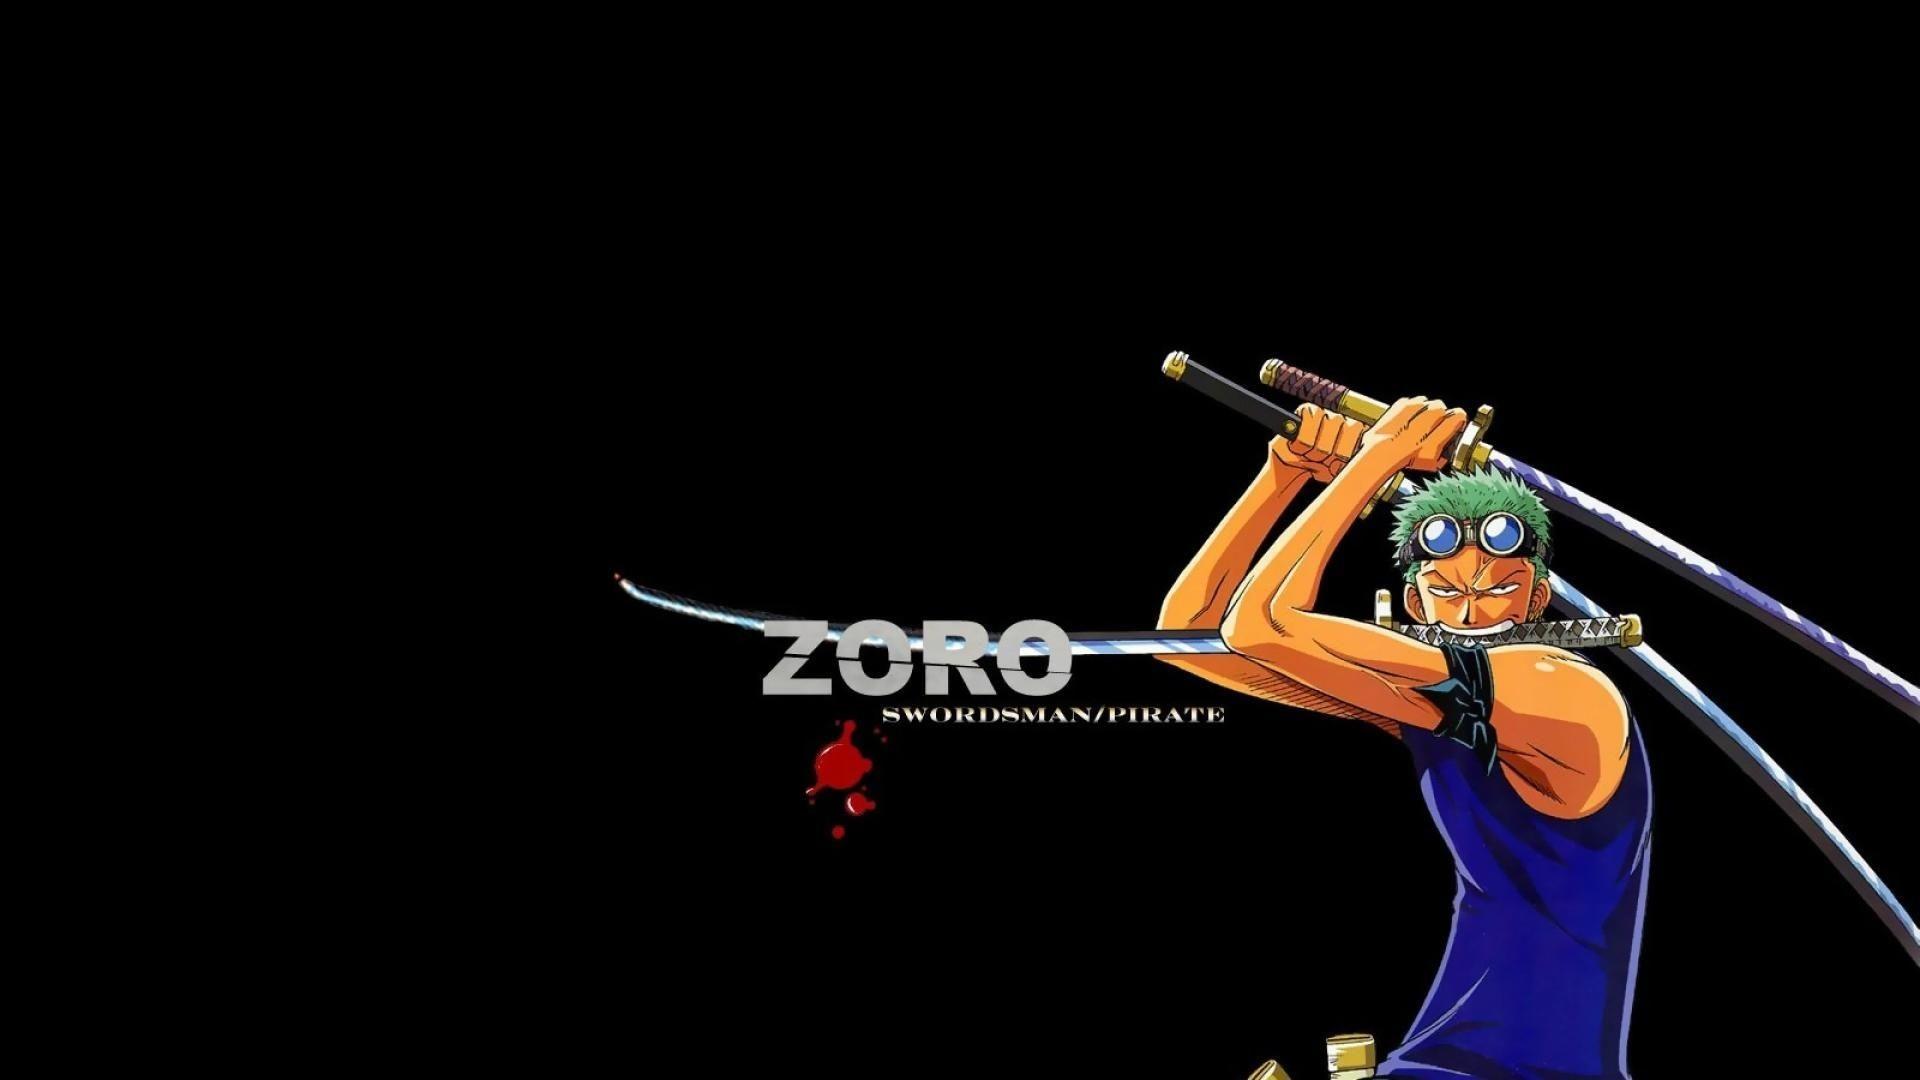 Zoro Wallpaper Hd 64 Images